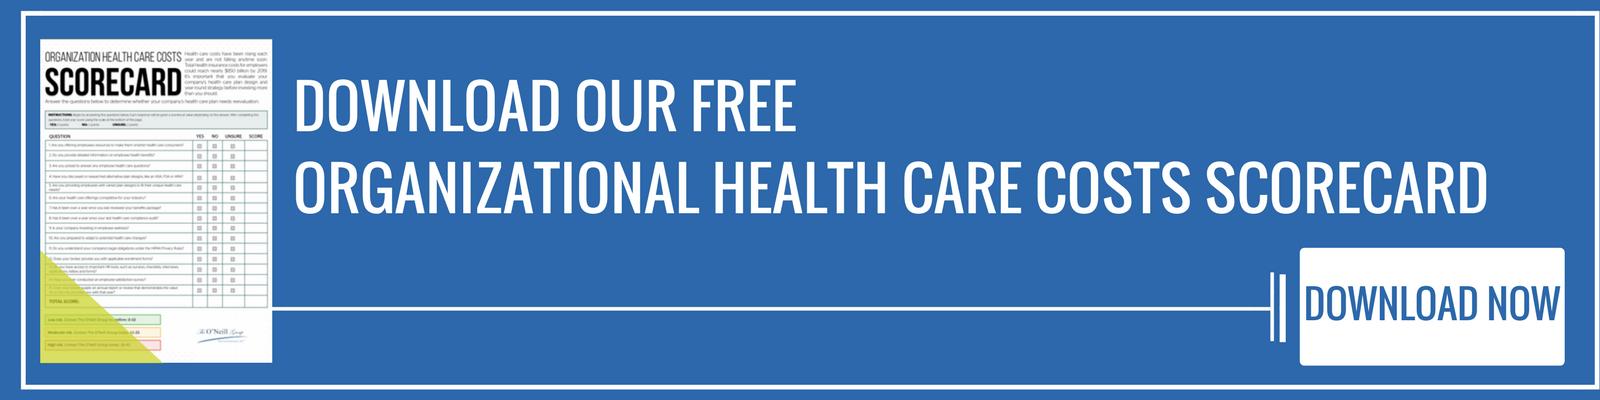 Organizational Health Care Costs